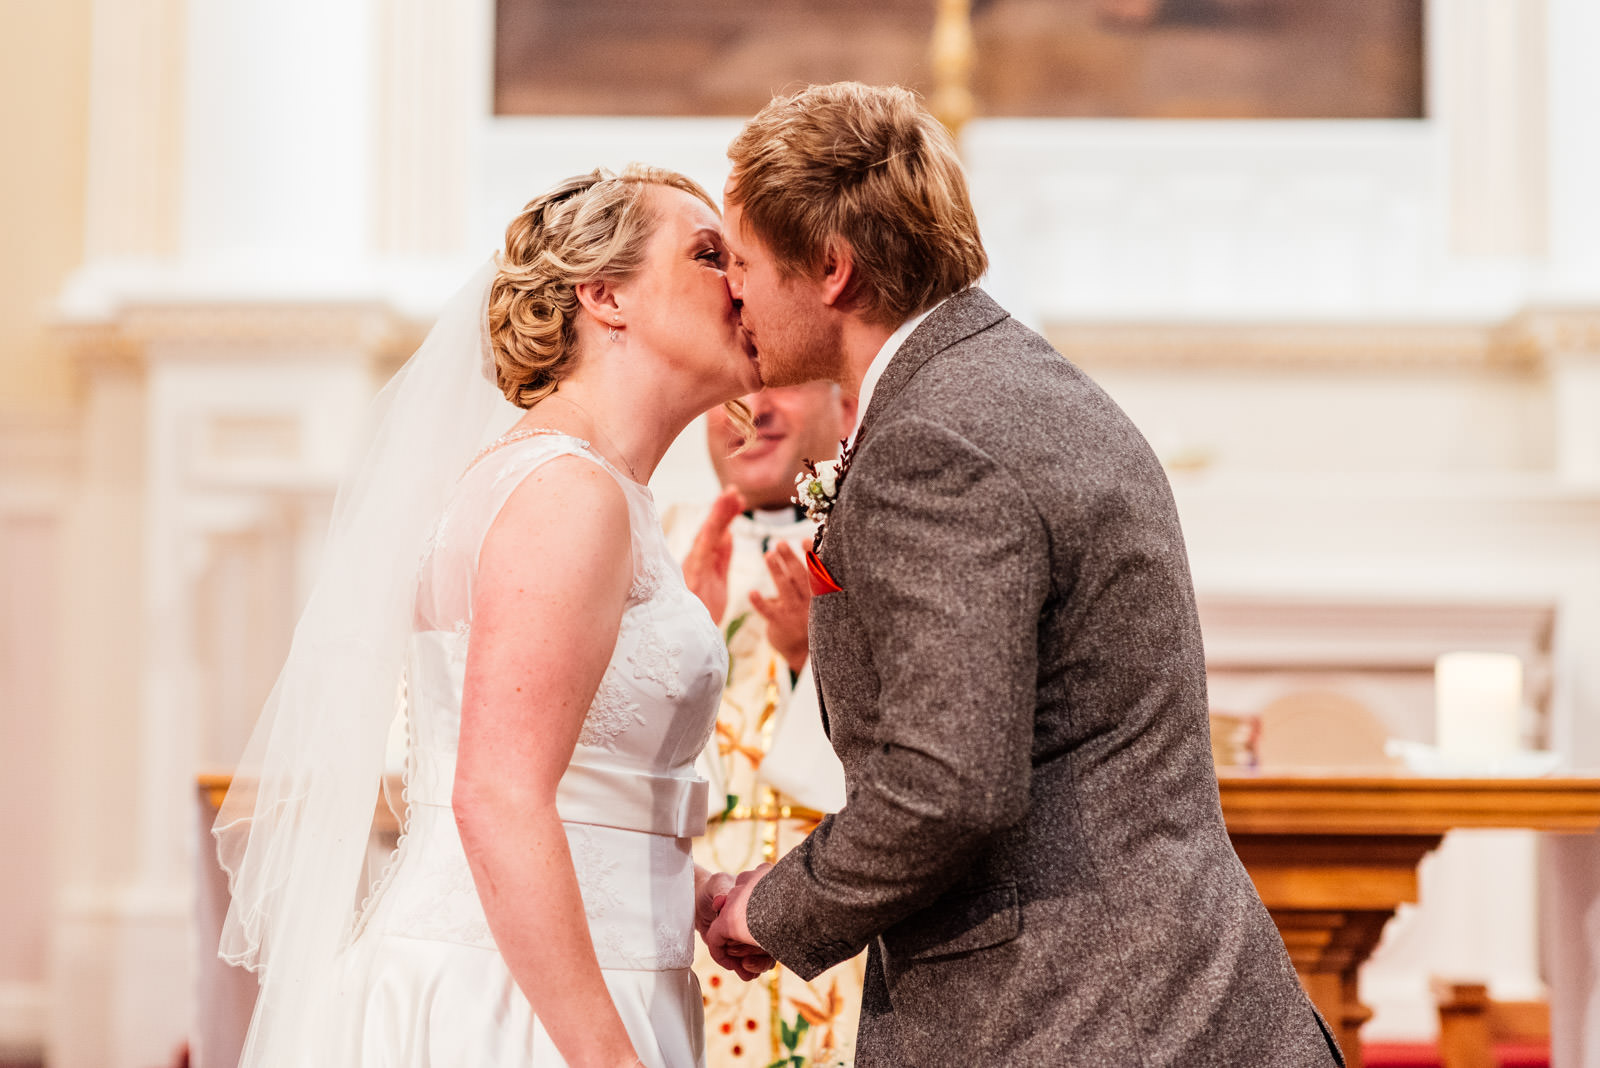 Wedding day first kiss